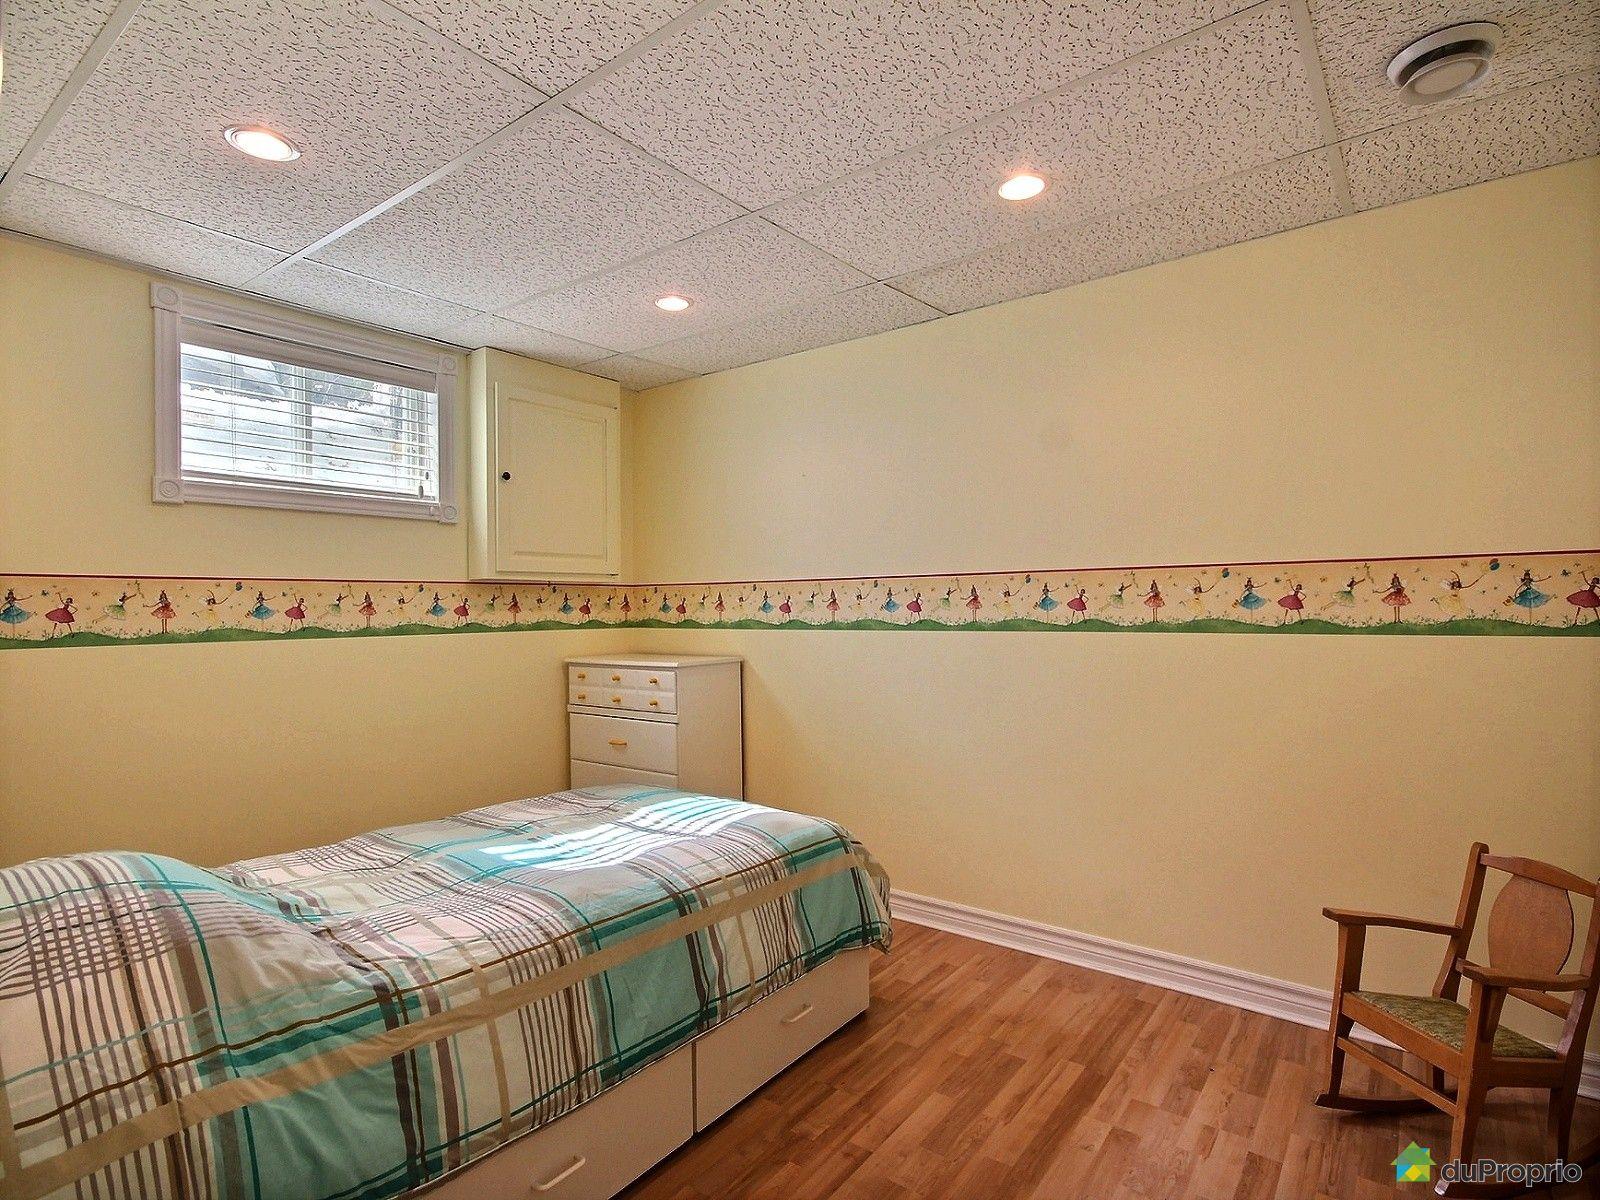 maison vendre jonqui re 3765 rue de montauban immobilier qu bec duproprio 686938. Black Bedroom Furniture Sets. Home Design Ideas